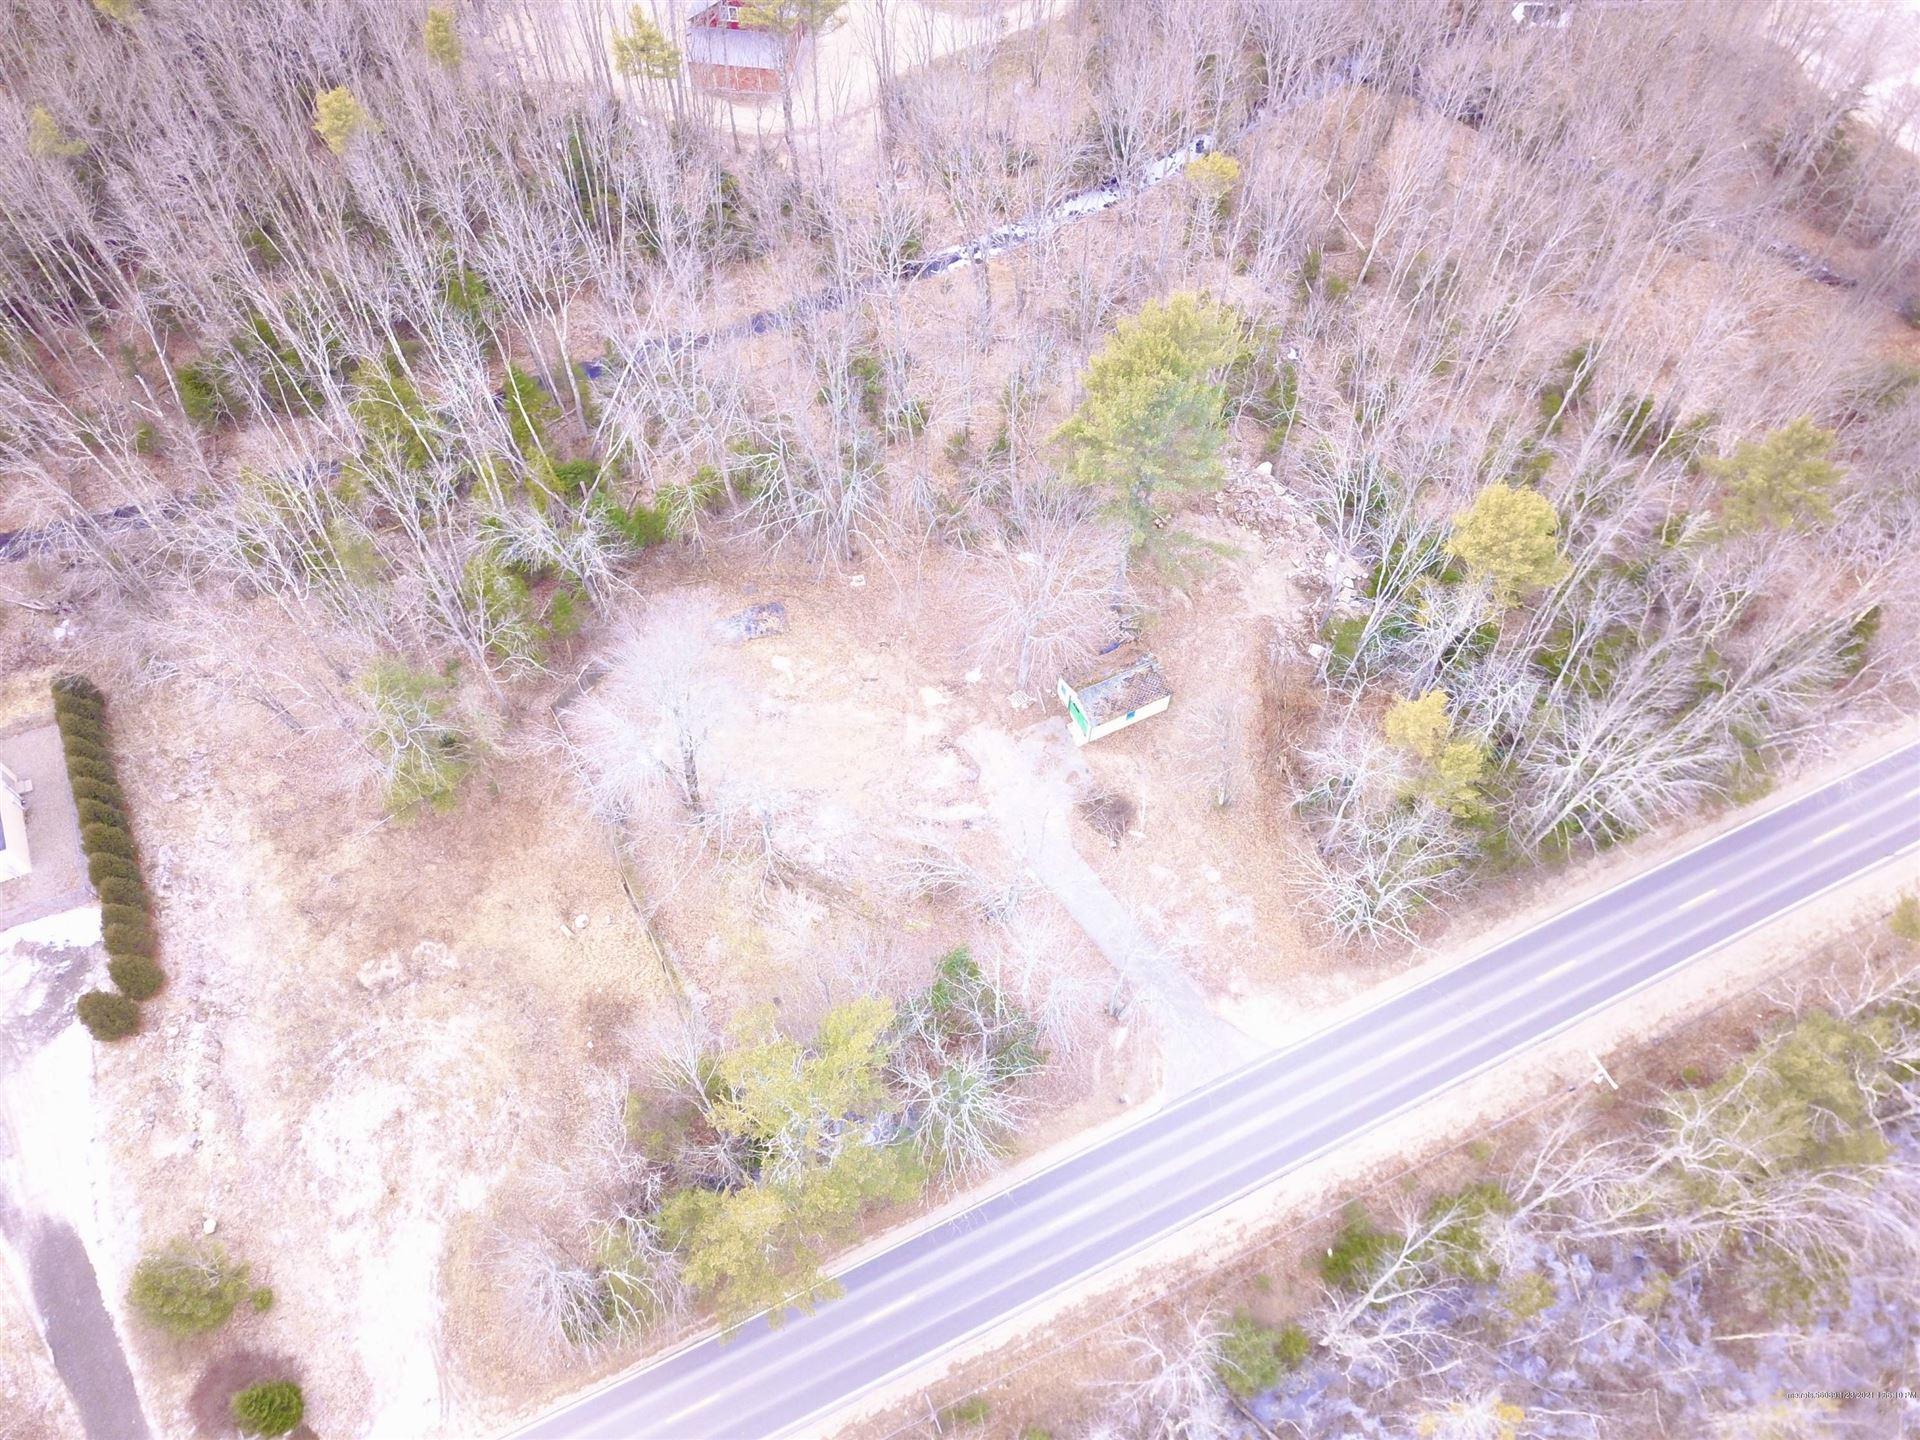 Photo of 46 Log Cabin Road, Arundel, ME 04046 (MLS # 1480414)